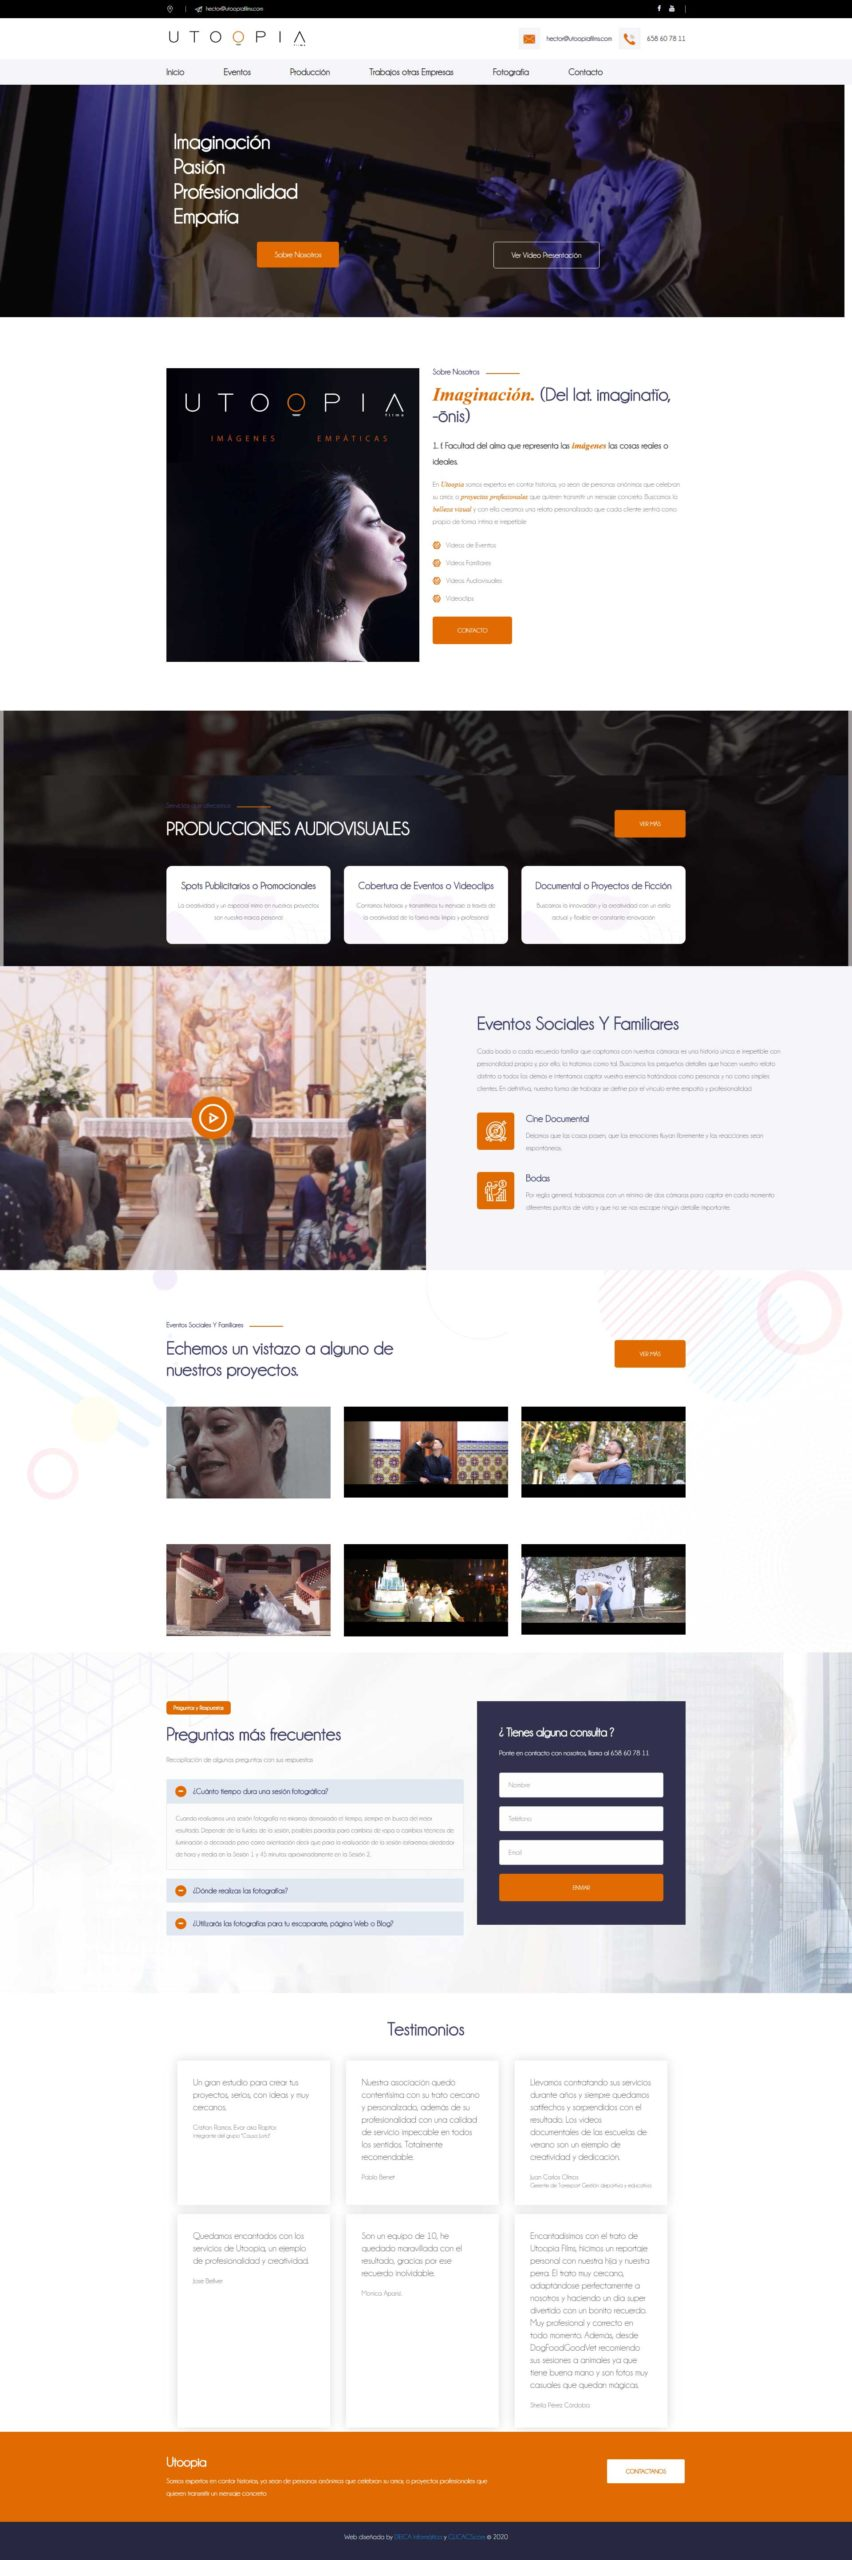 diseño de página web de utoopiafilms